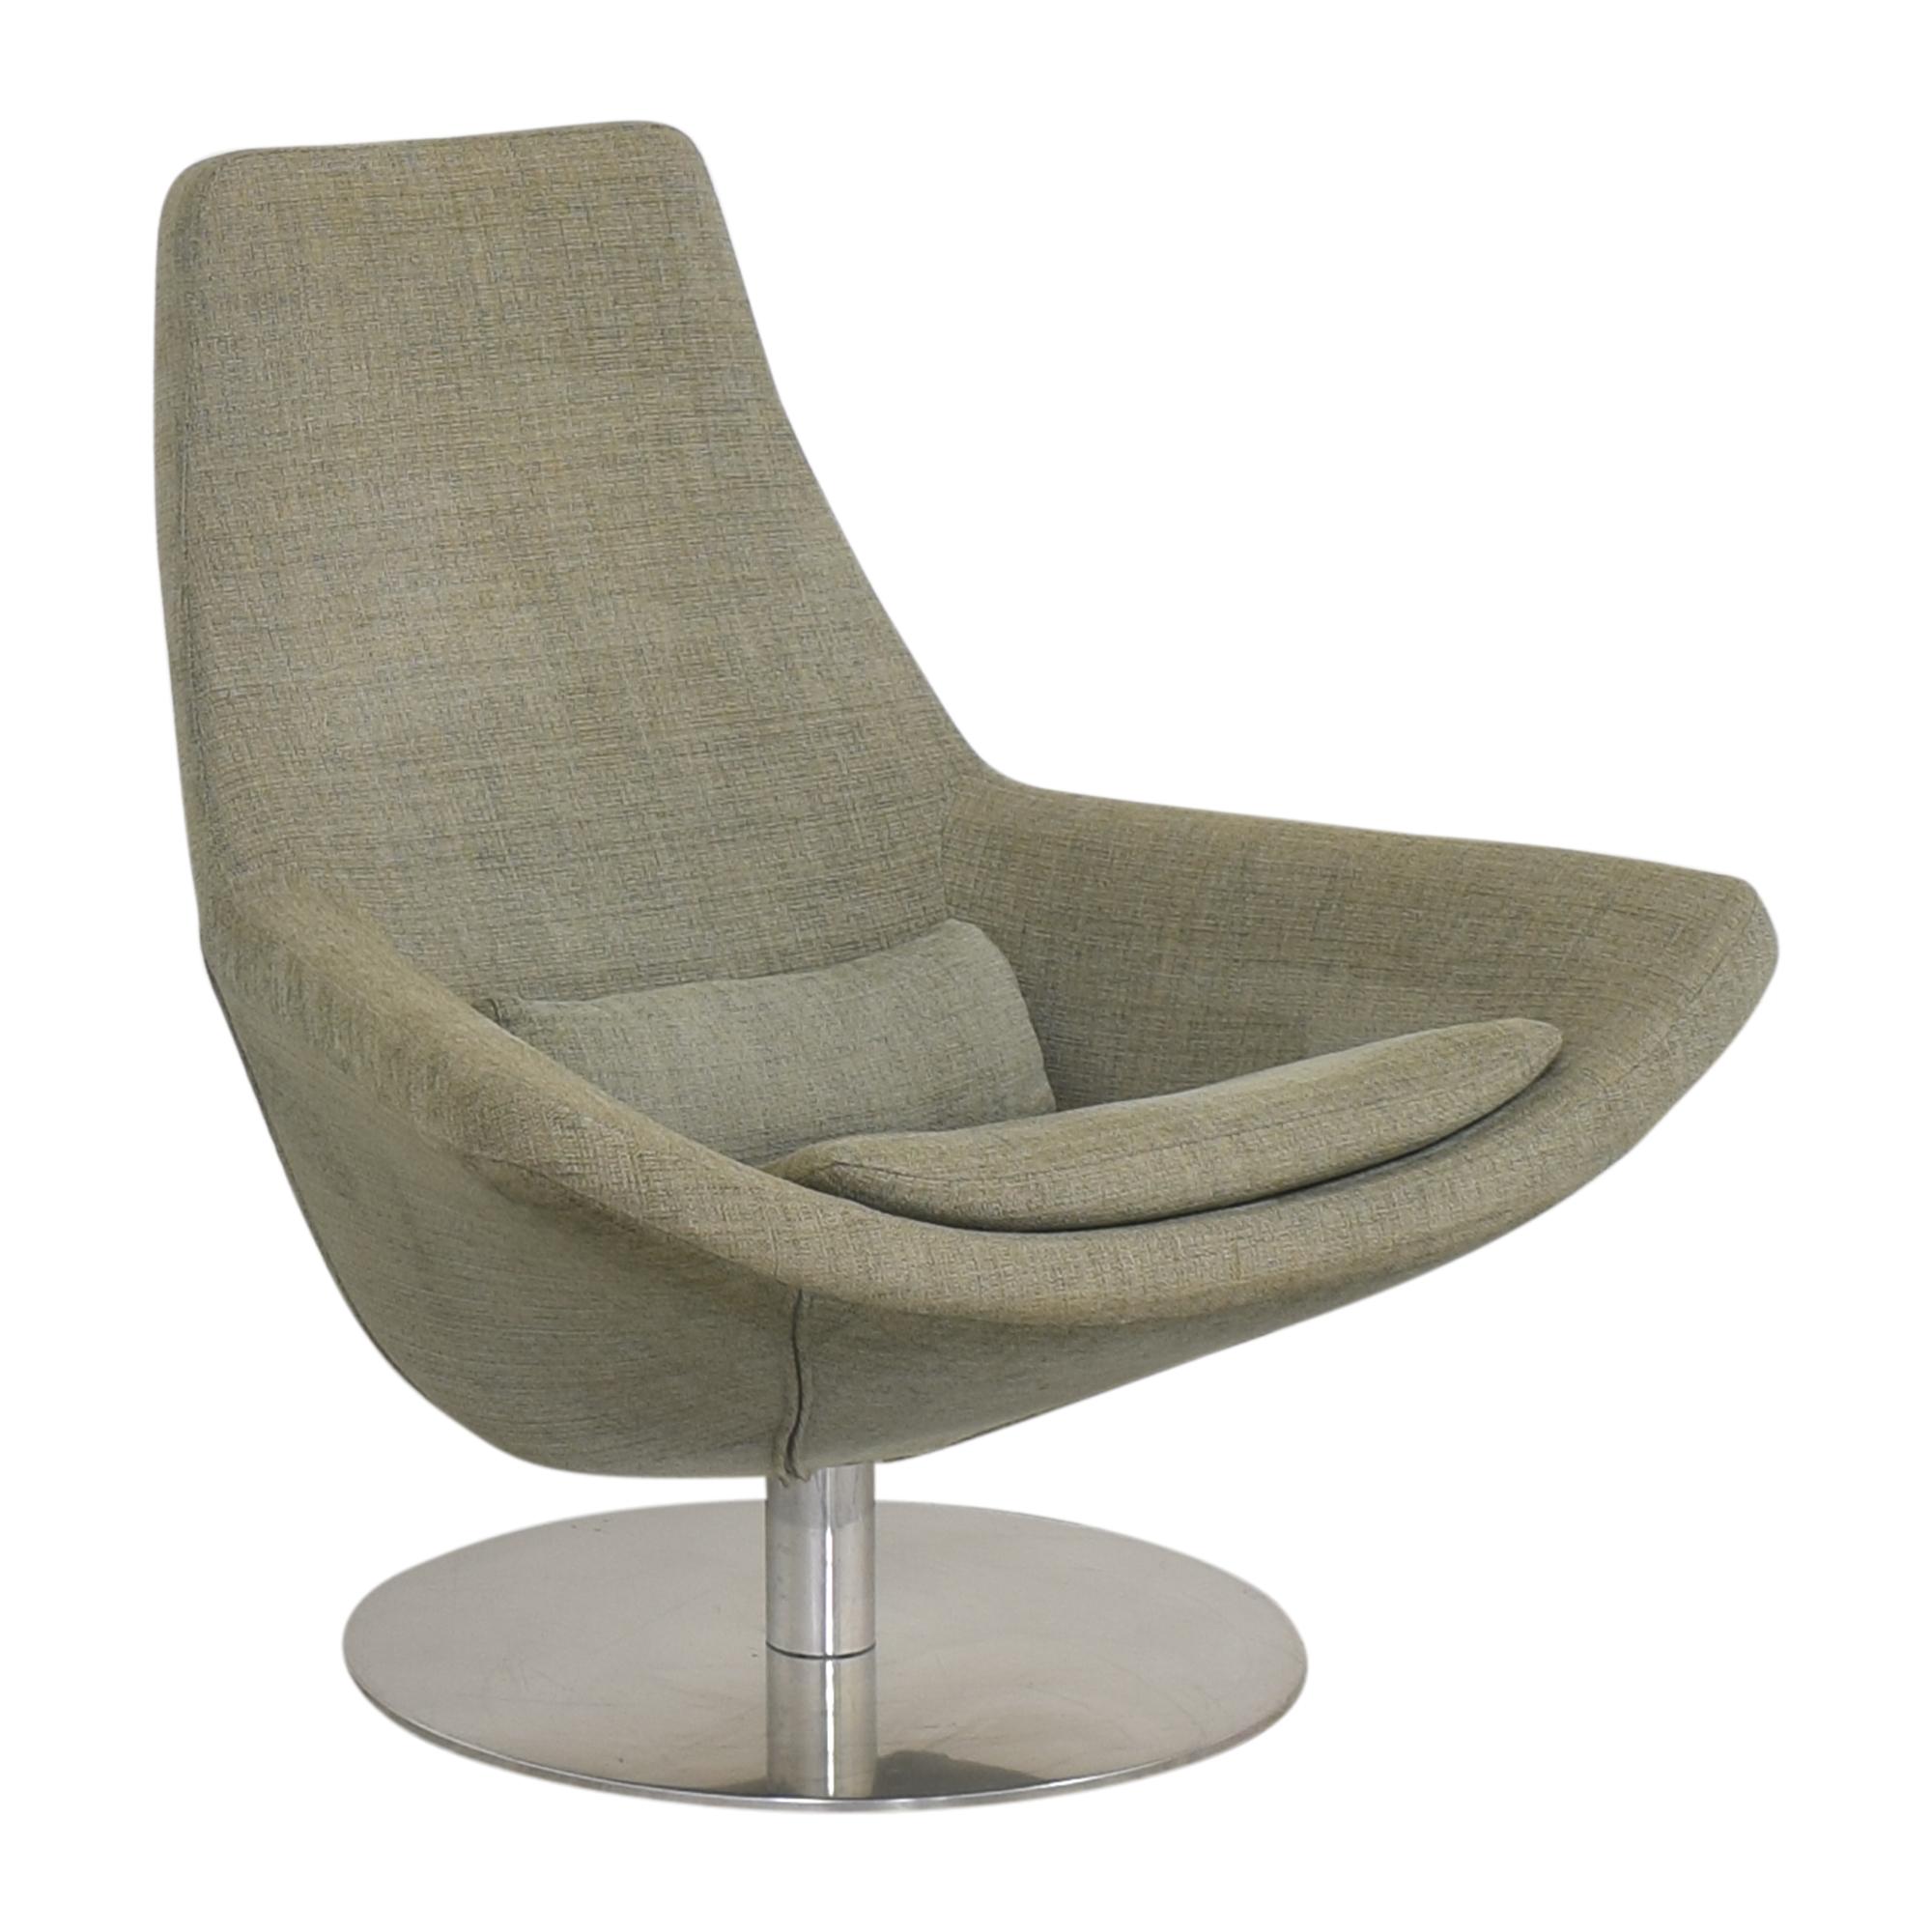 shop B&B Italia Metropolitan Swivel Chair B&B Italia Chairs